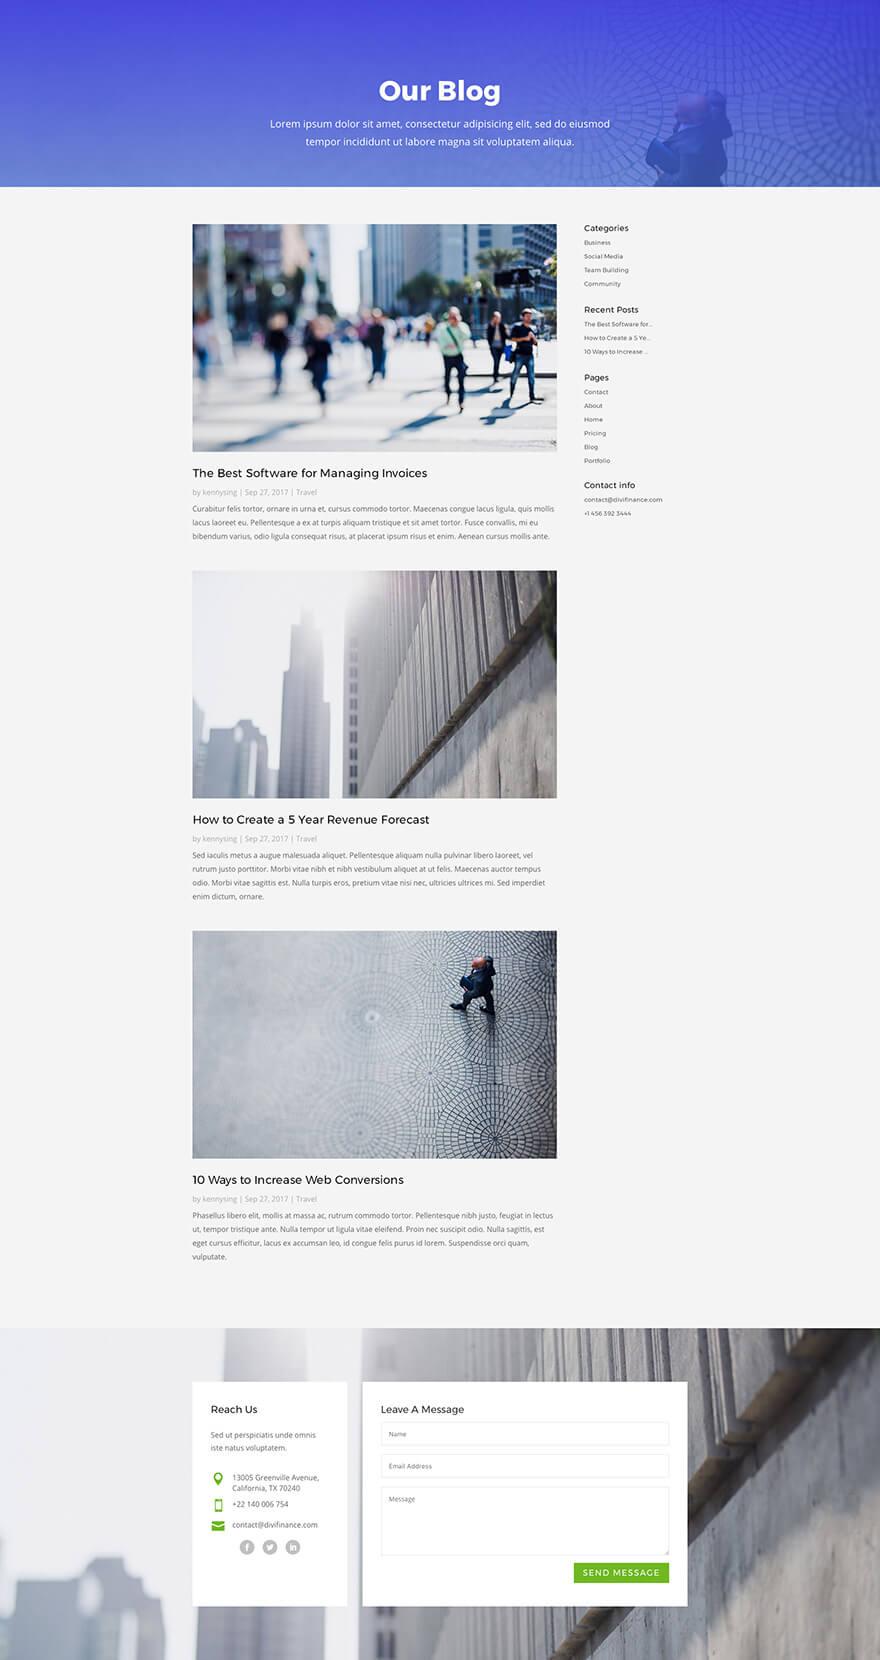 Návrh stránky blog